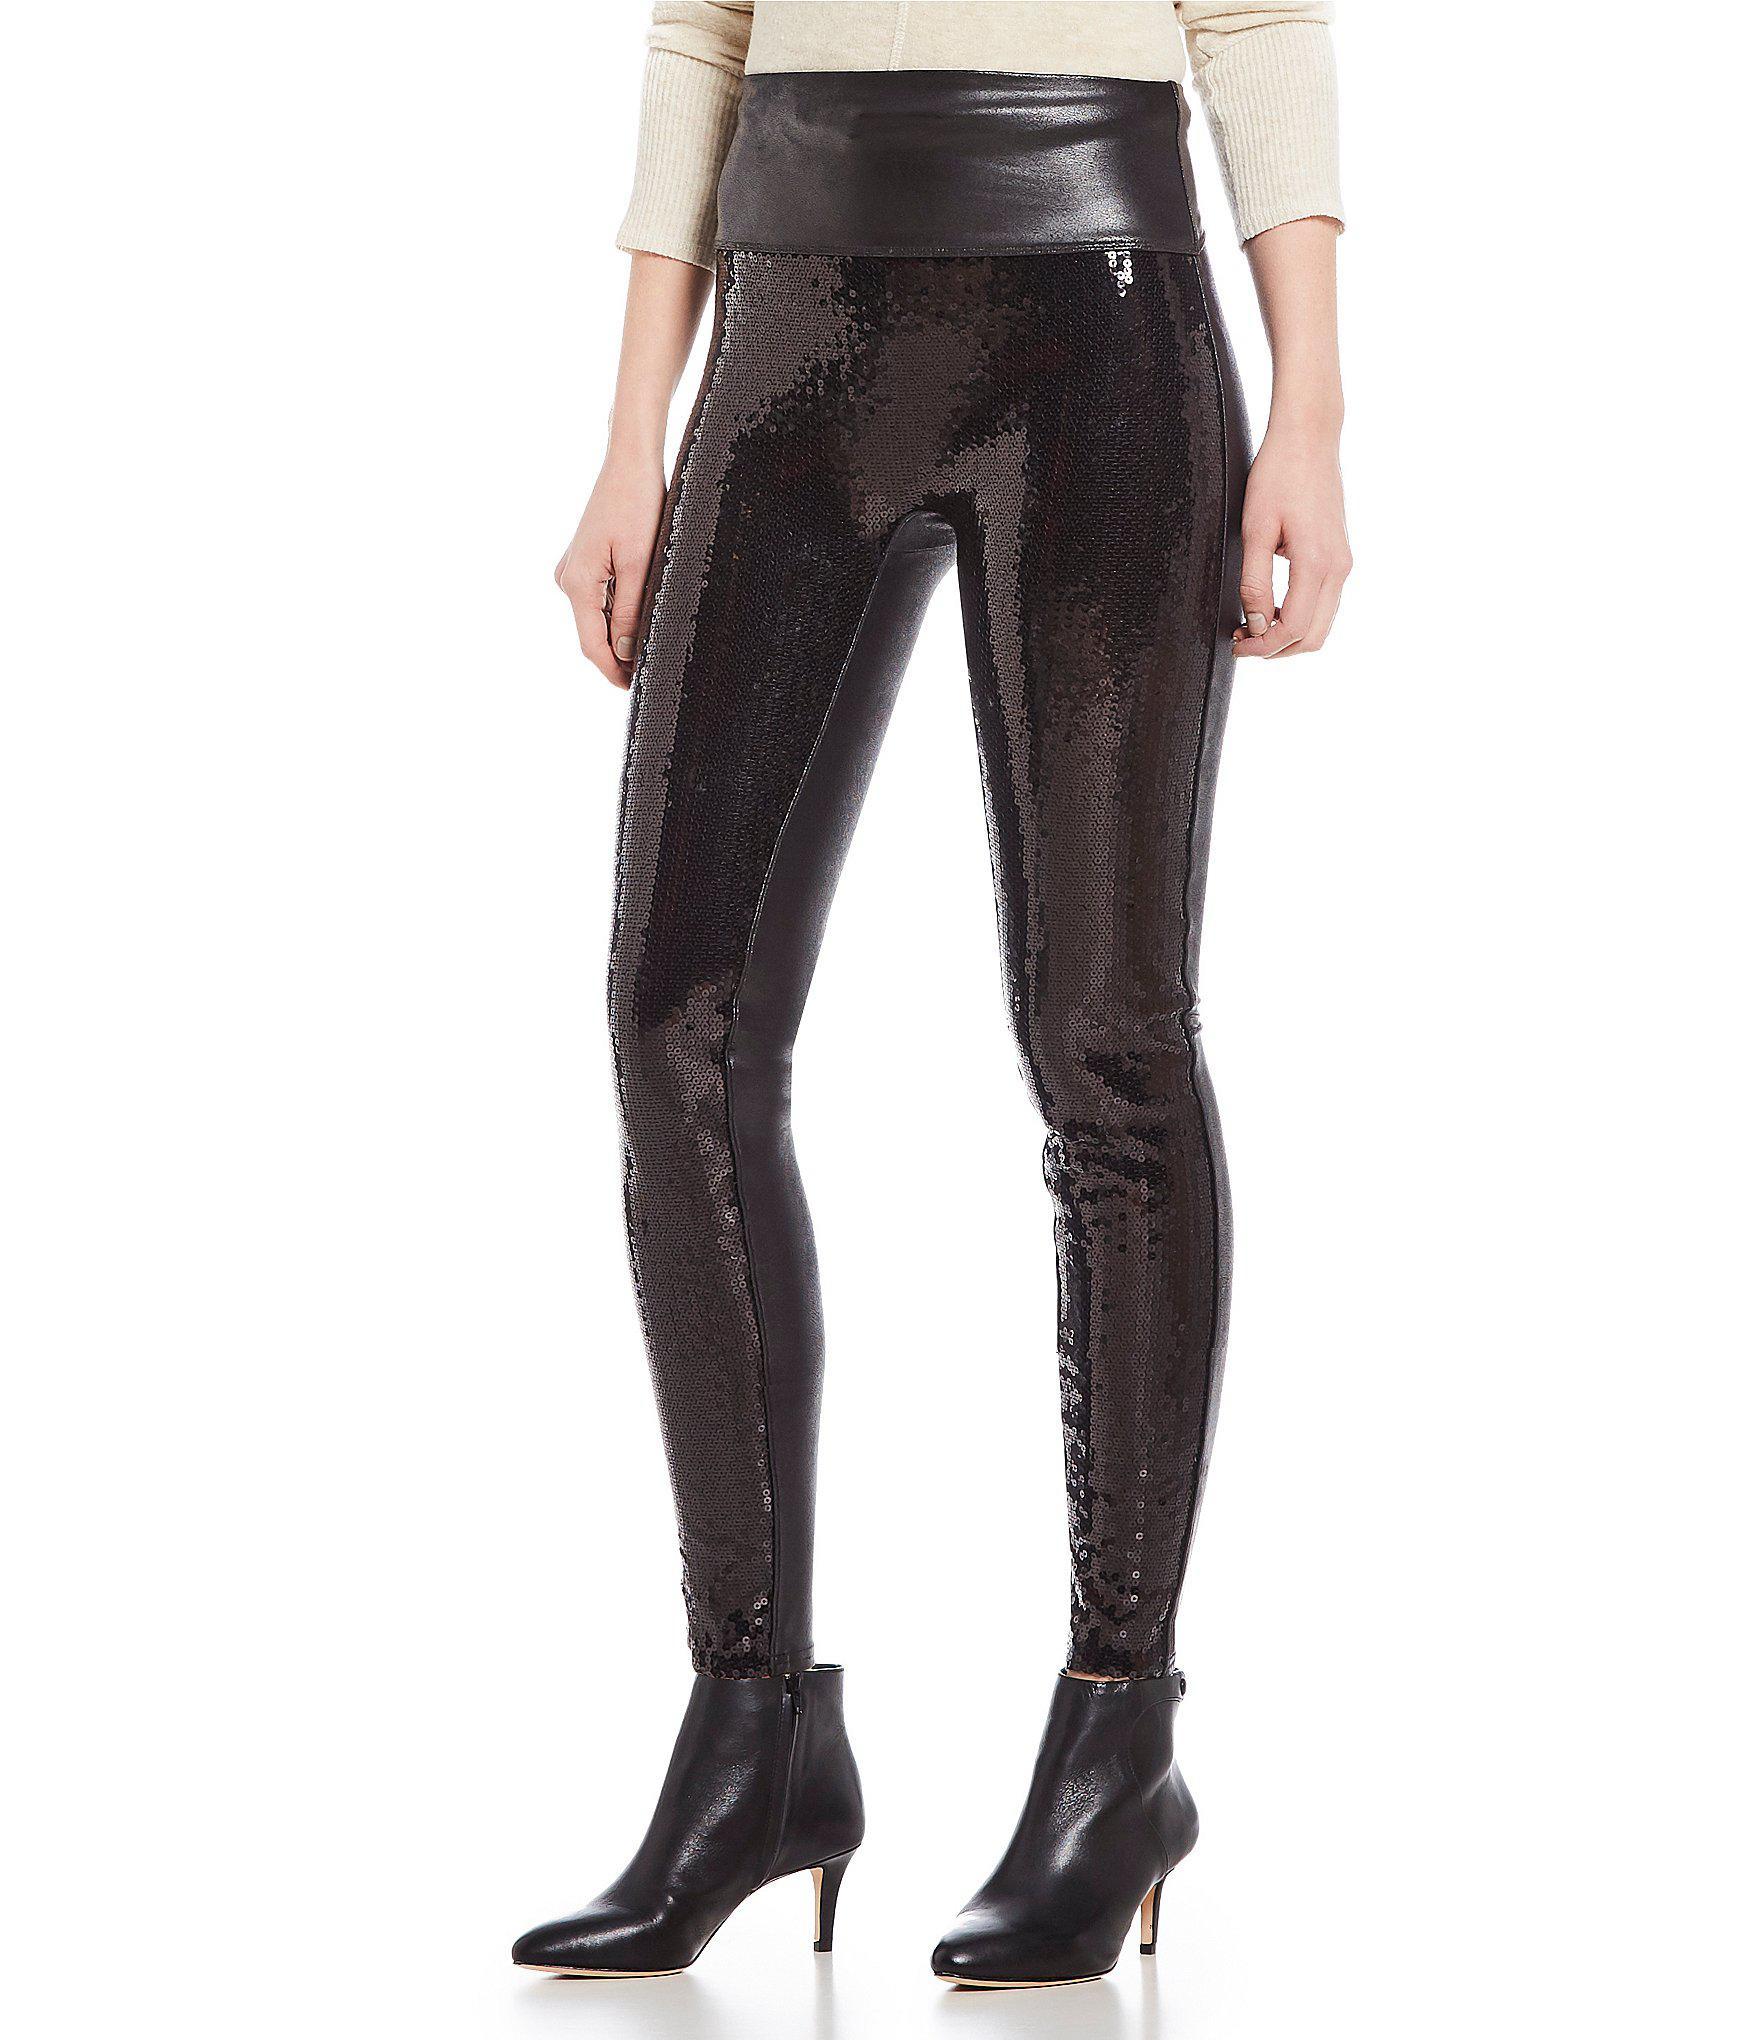 75e0c9da098c5 Spanx Faux Leather Sequin Legging in Black - Lyst